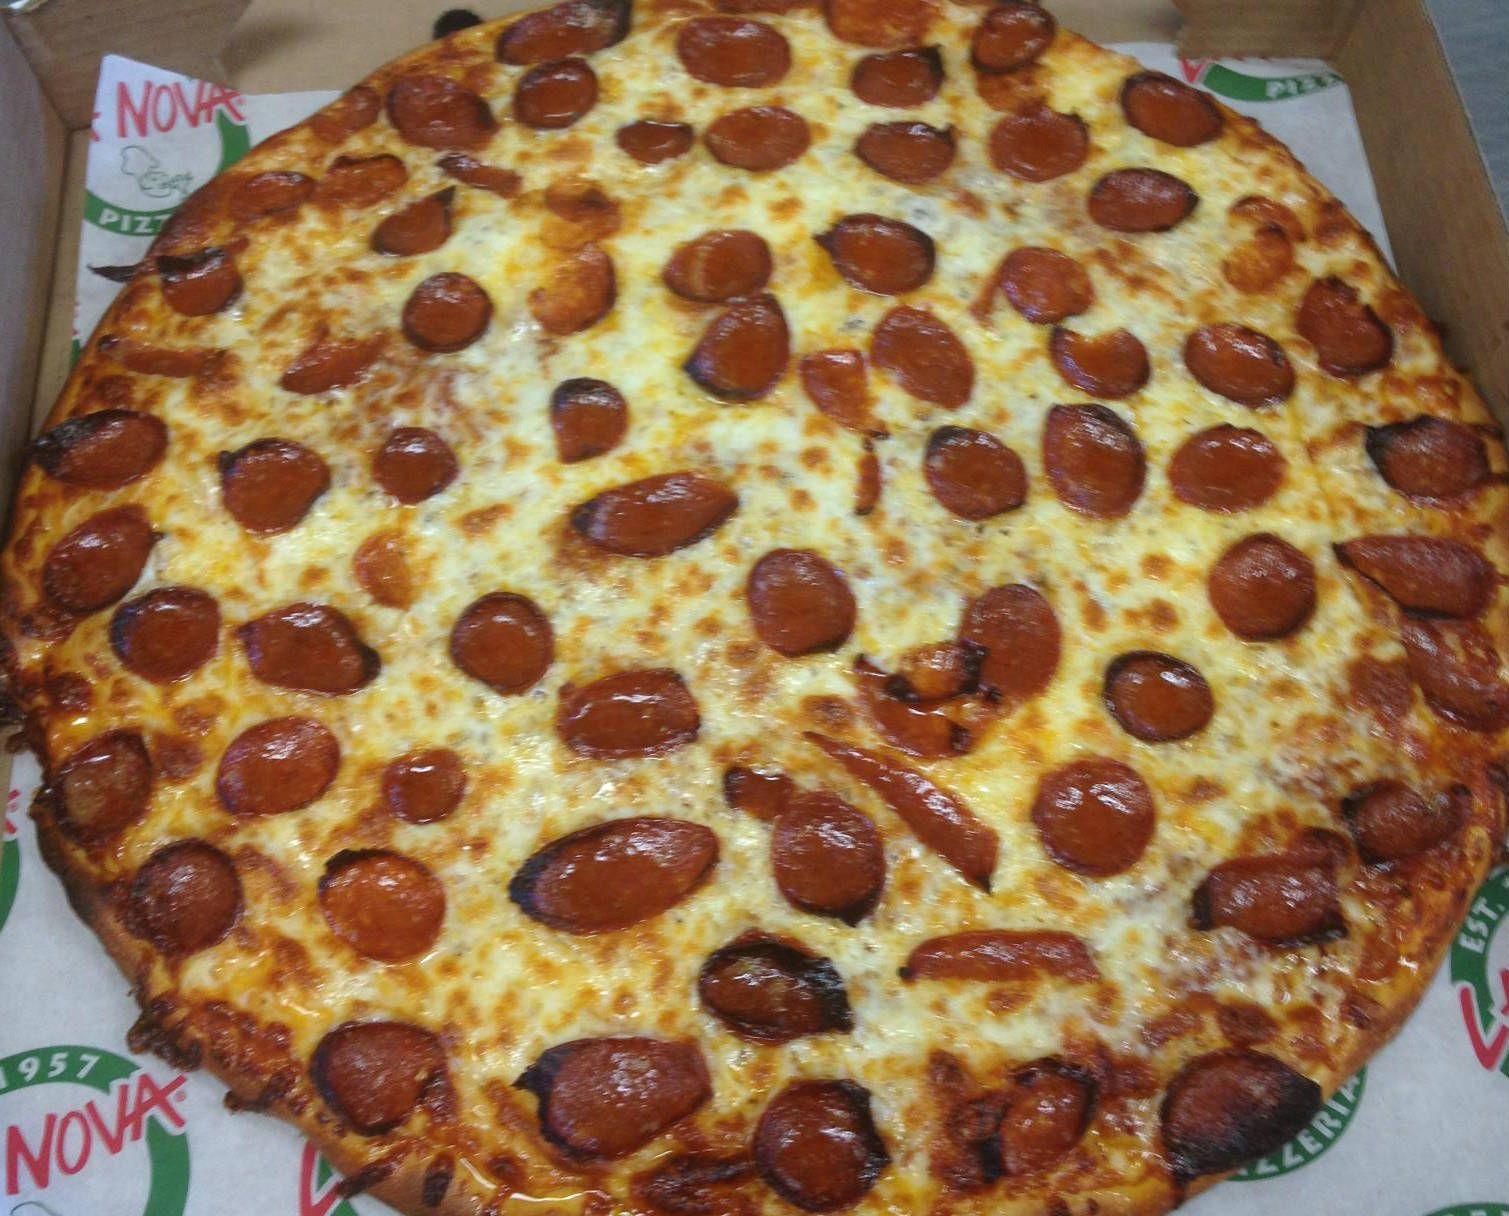 la nova pizza | La Nova Pizzeria photo | Buffalo Foods | Pinterest ...